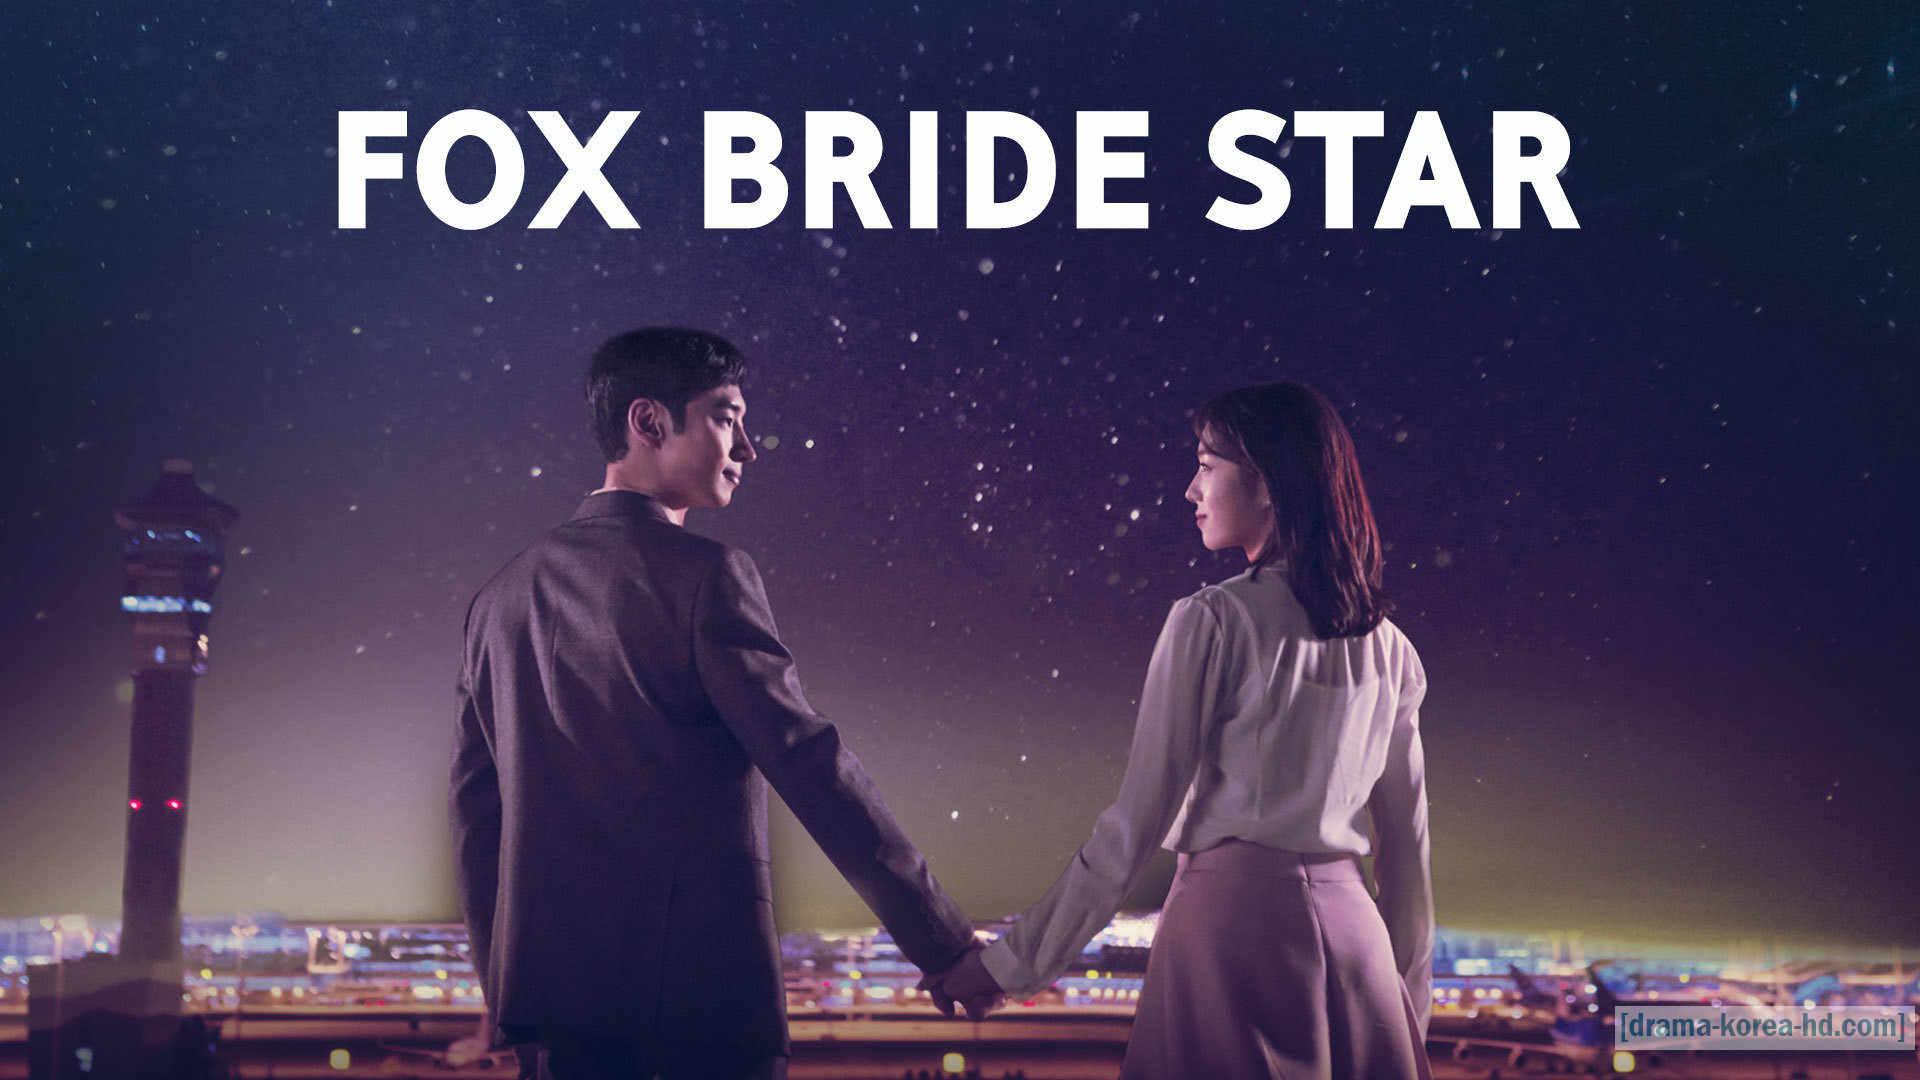 Where Stars Land / Fox Bride Star drama korea